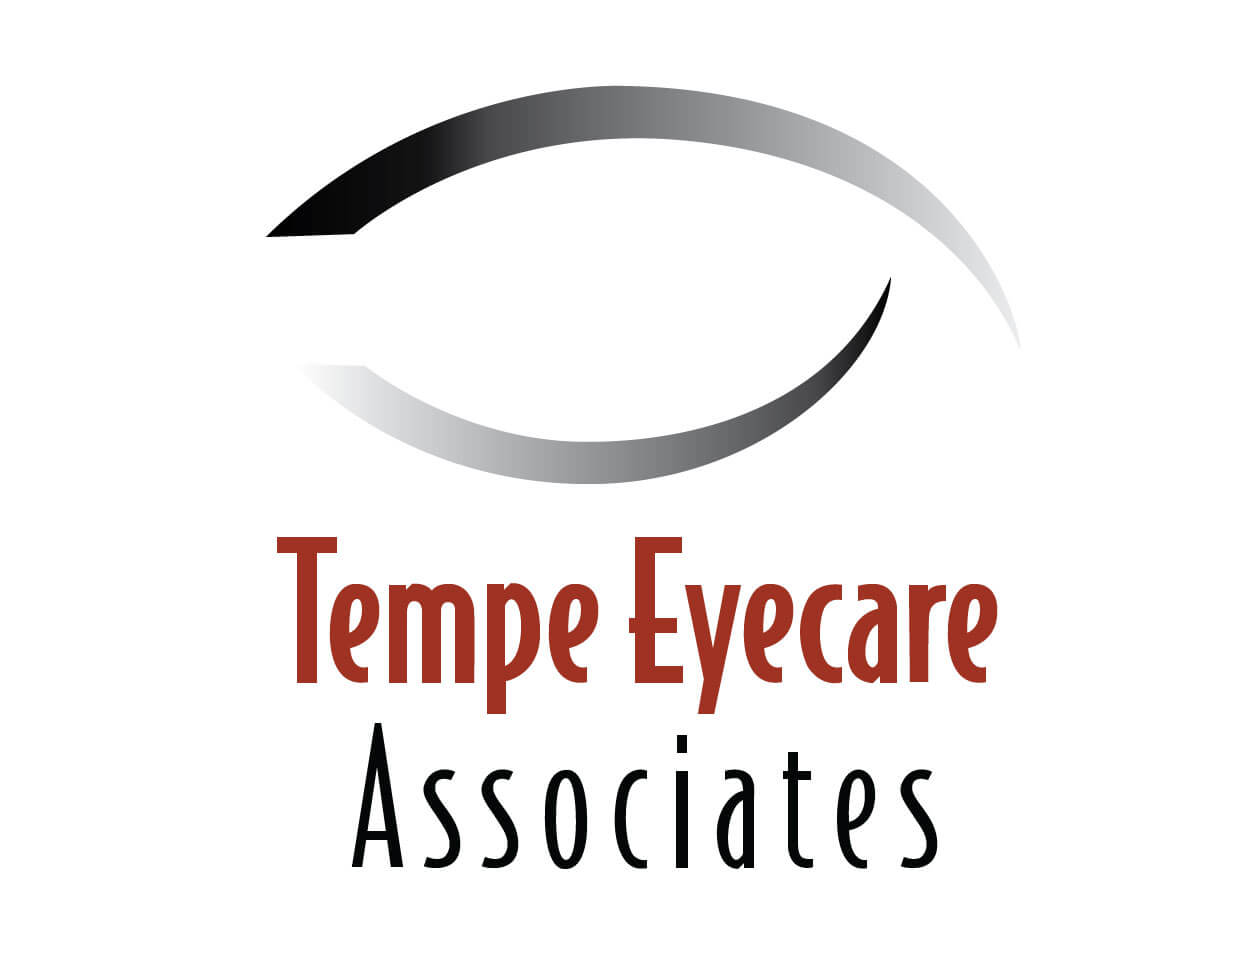 Tempe Eyecare Associates